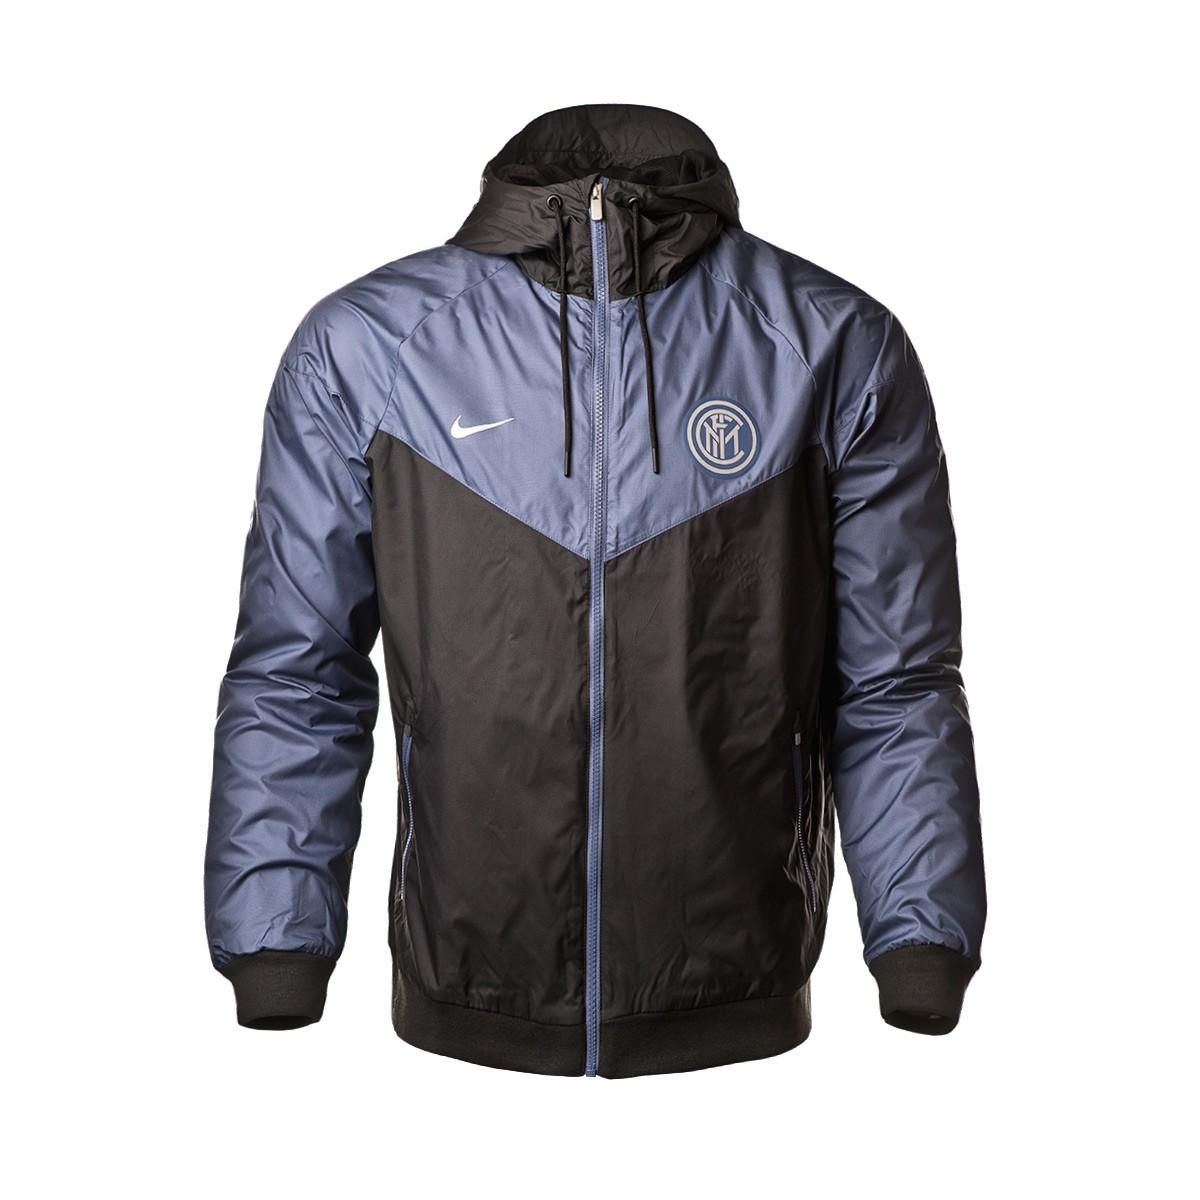 53b78789a4 Jacket Nike Inter Milan Windrunner 2018-2019 Black-Diffused blue ...